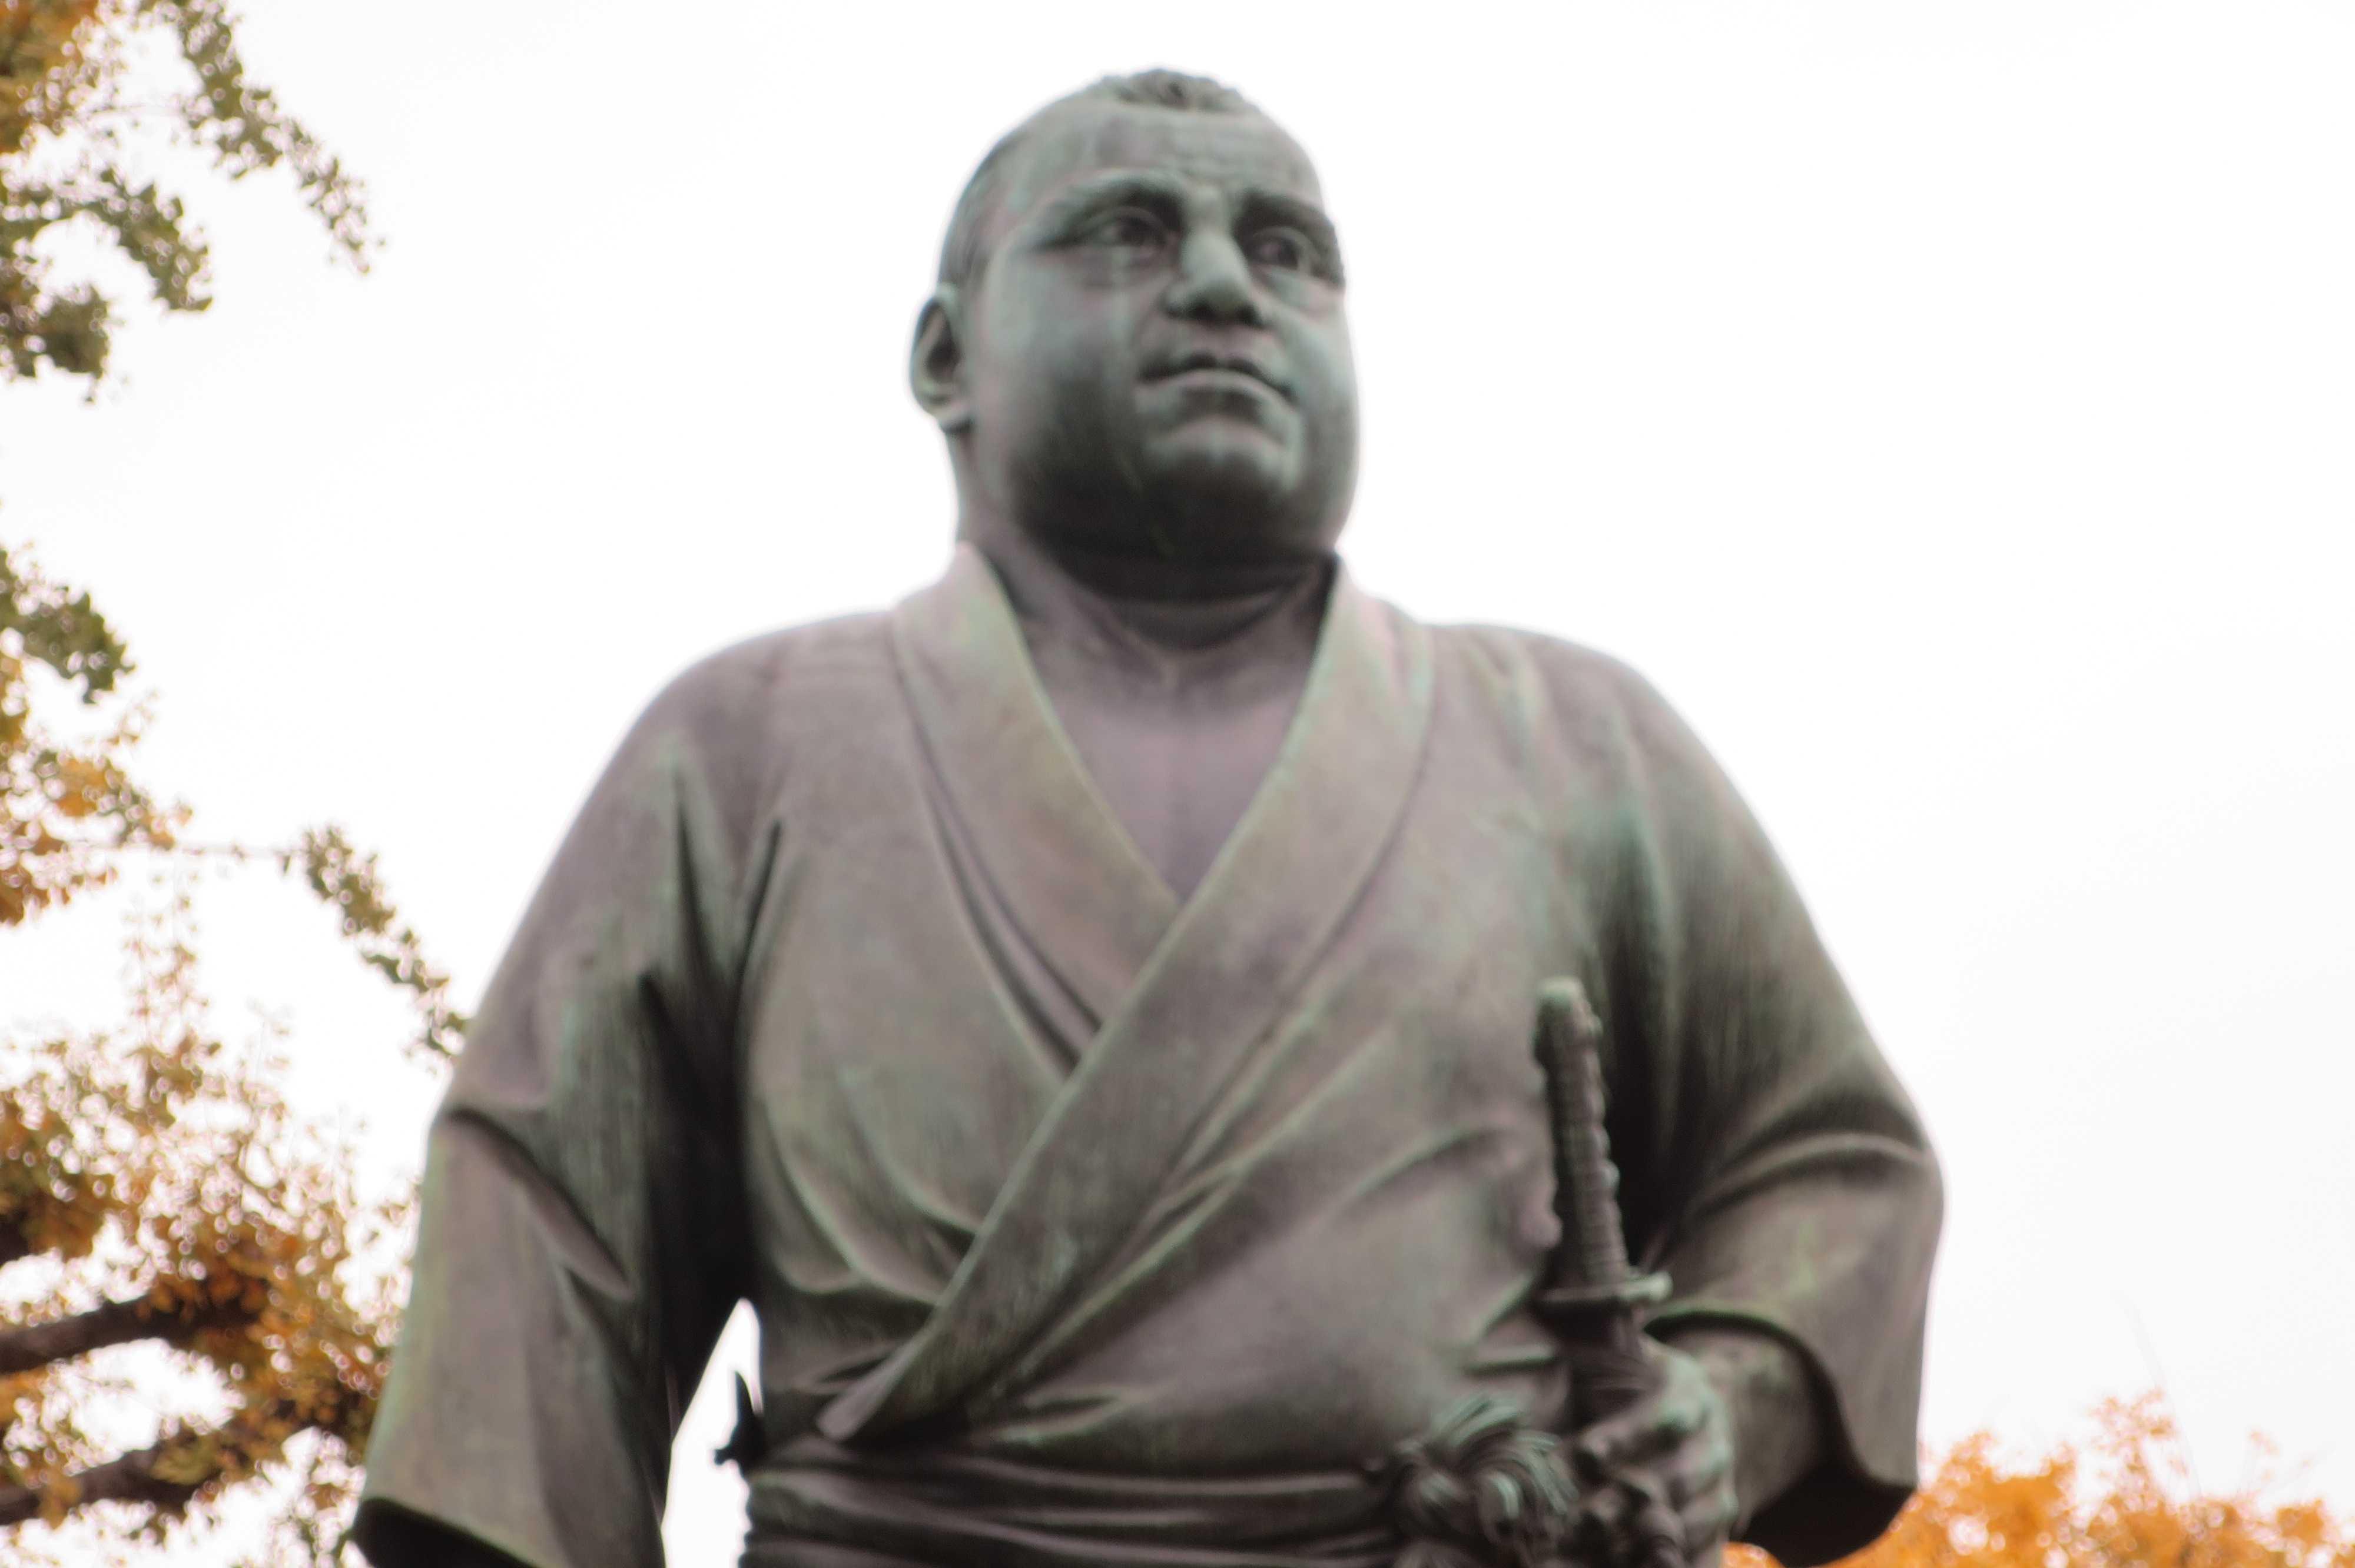 大西郷の銅像 - 上野公園